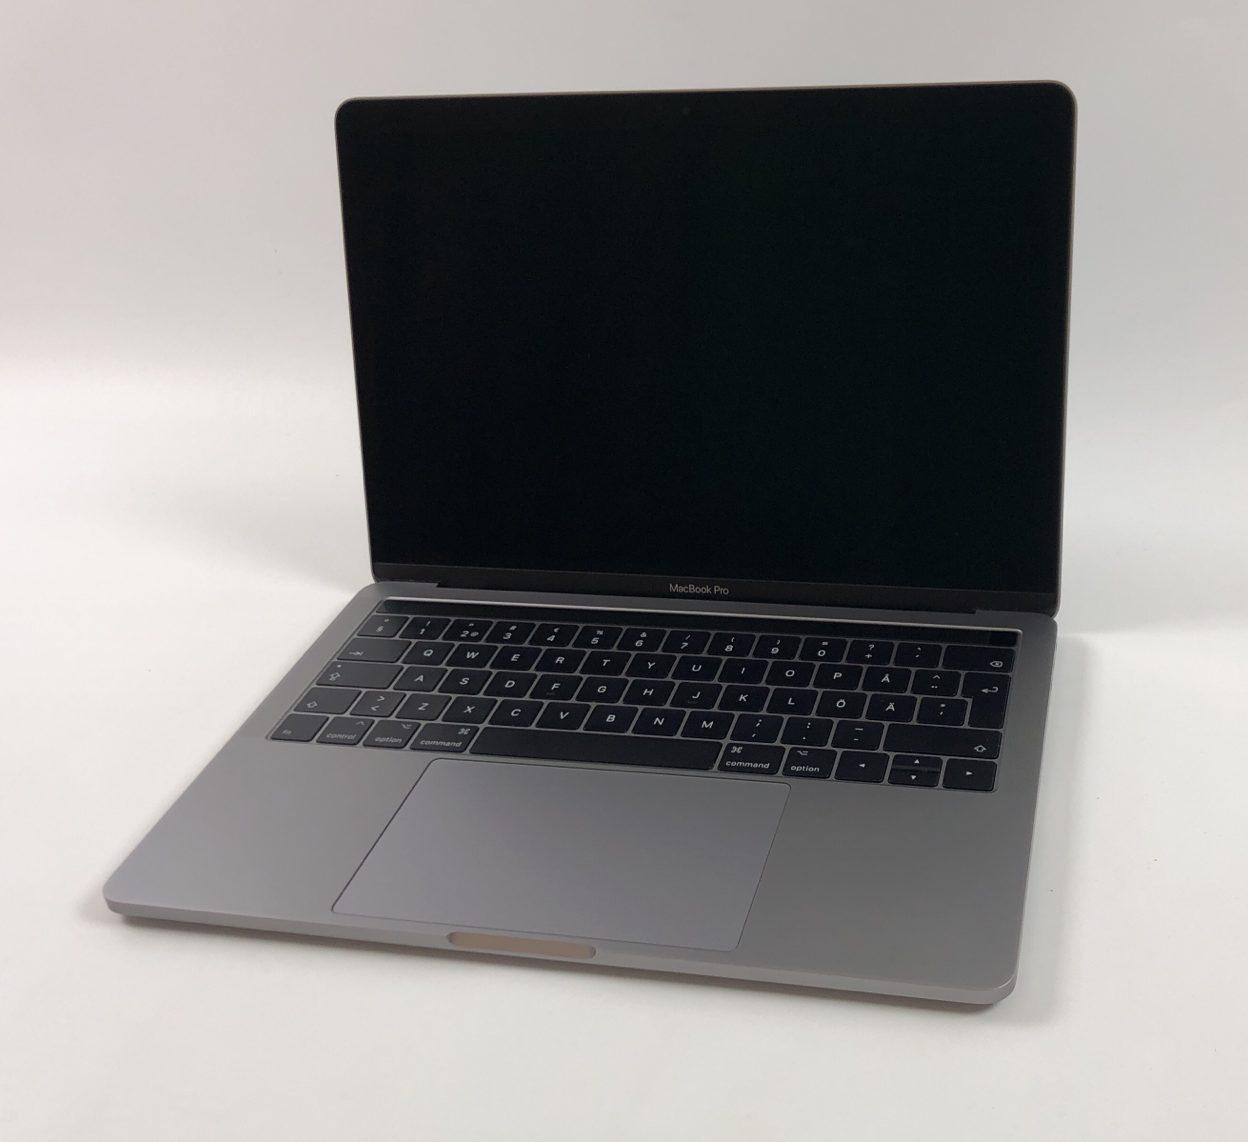 "MacBook Pro 13"" 4TBT Late 2016 (Intel Core i5 2.9 GHz 8 GB RAM 256 GB SSD), Space Gray, Intel Core i5 2.9 GHz, 8 GB RAM, 256 GB SSD, Kuva 1"